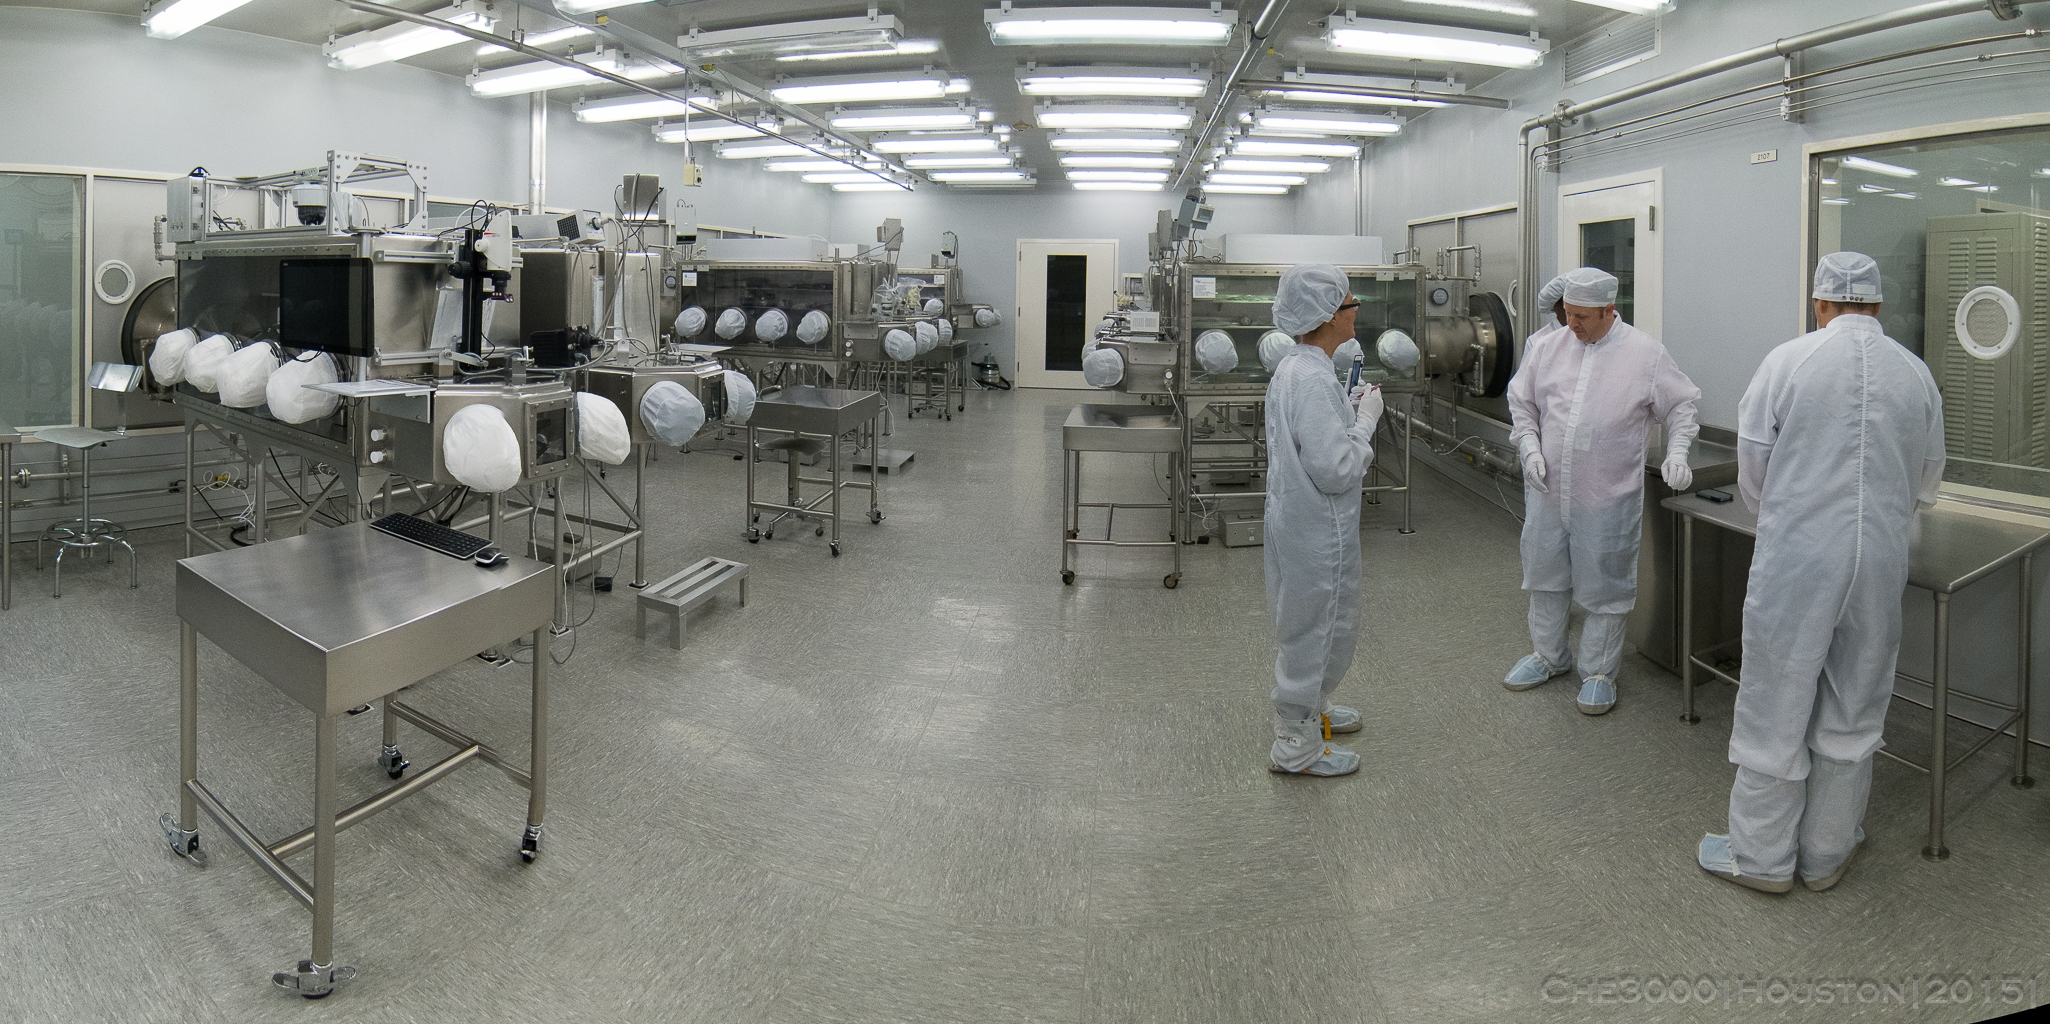 Laboratory_002